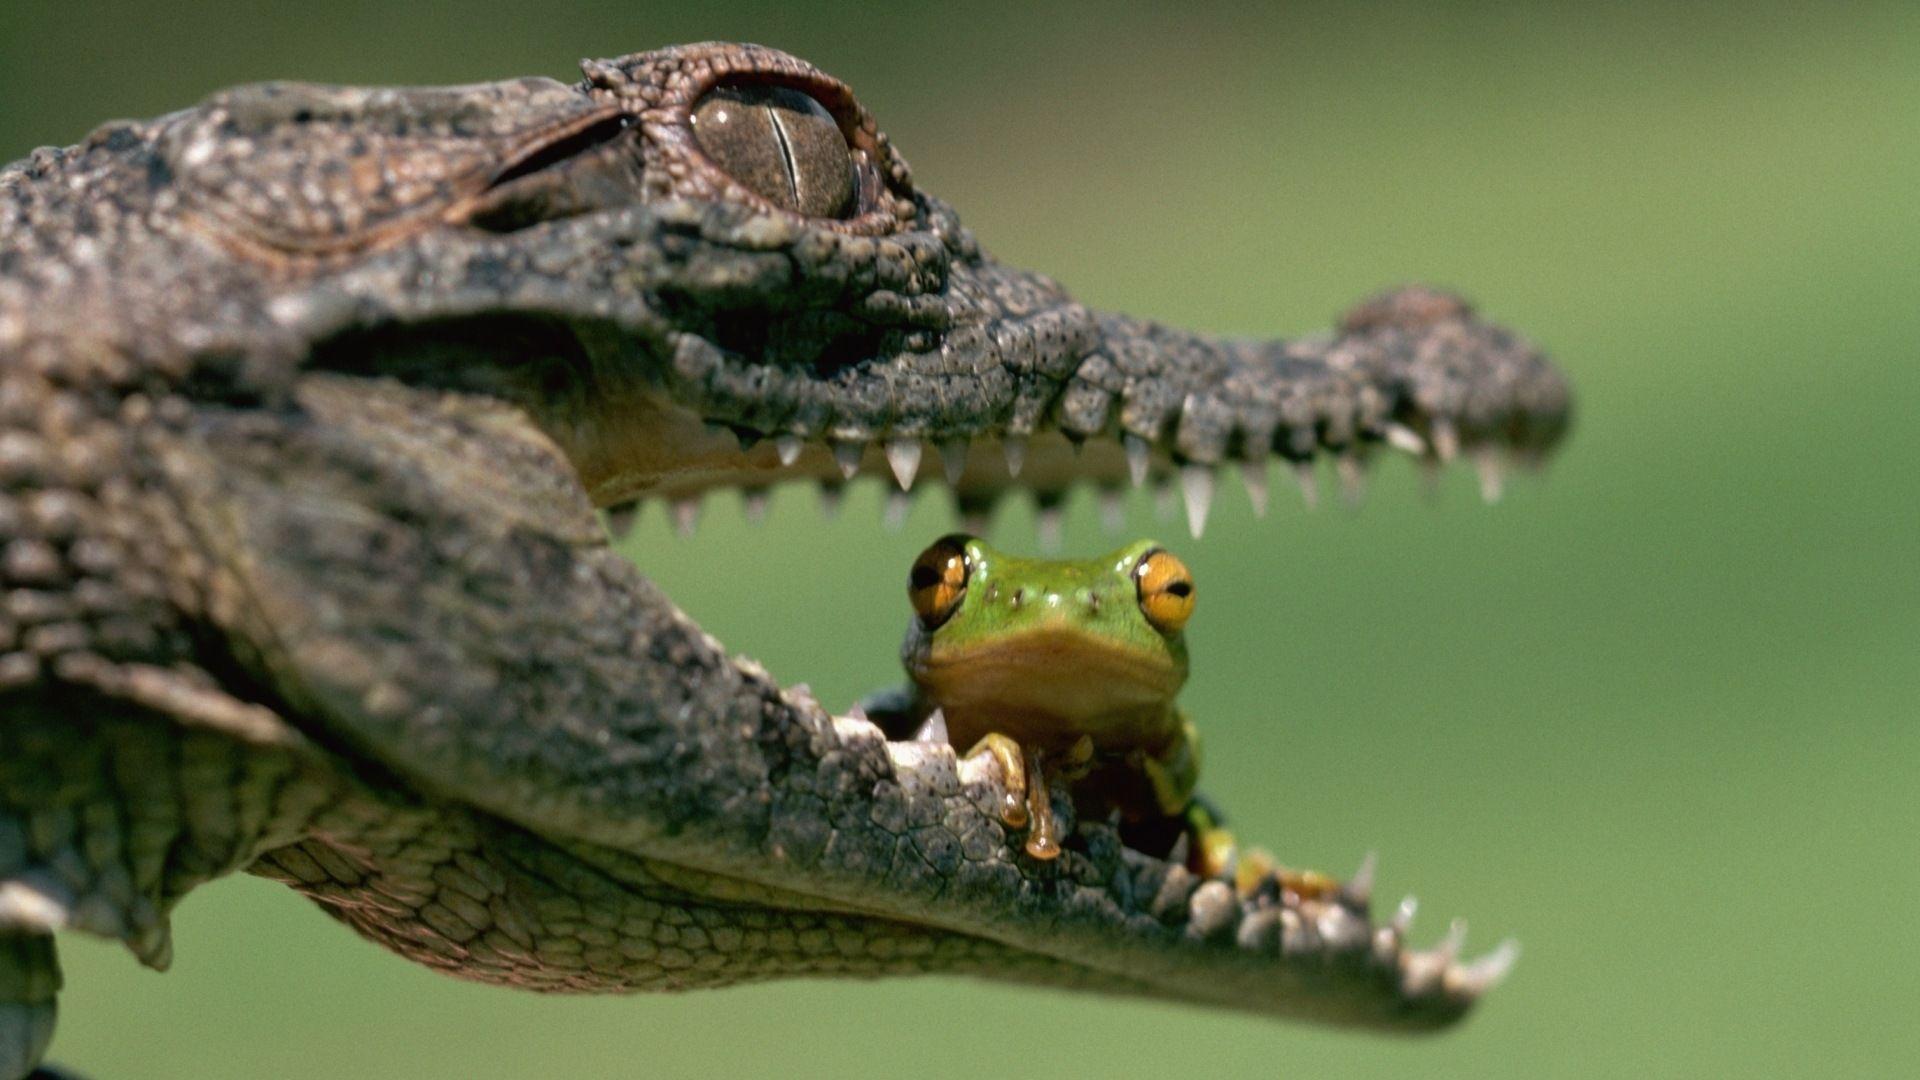 Crocodile wallpaper theme